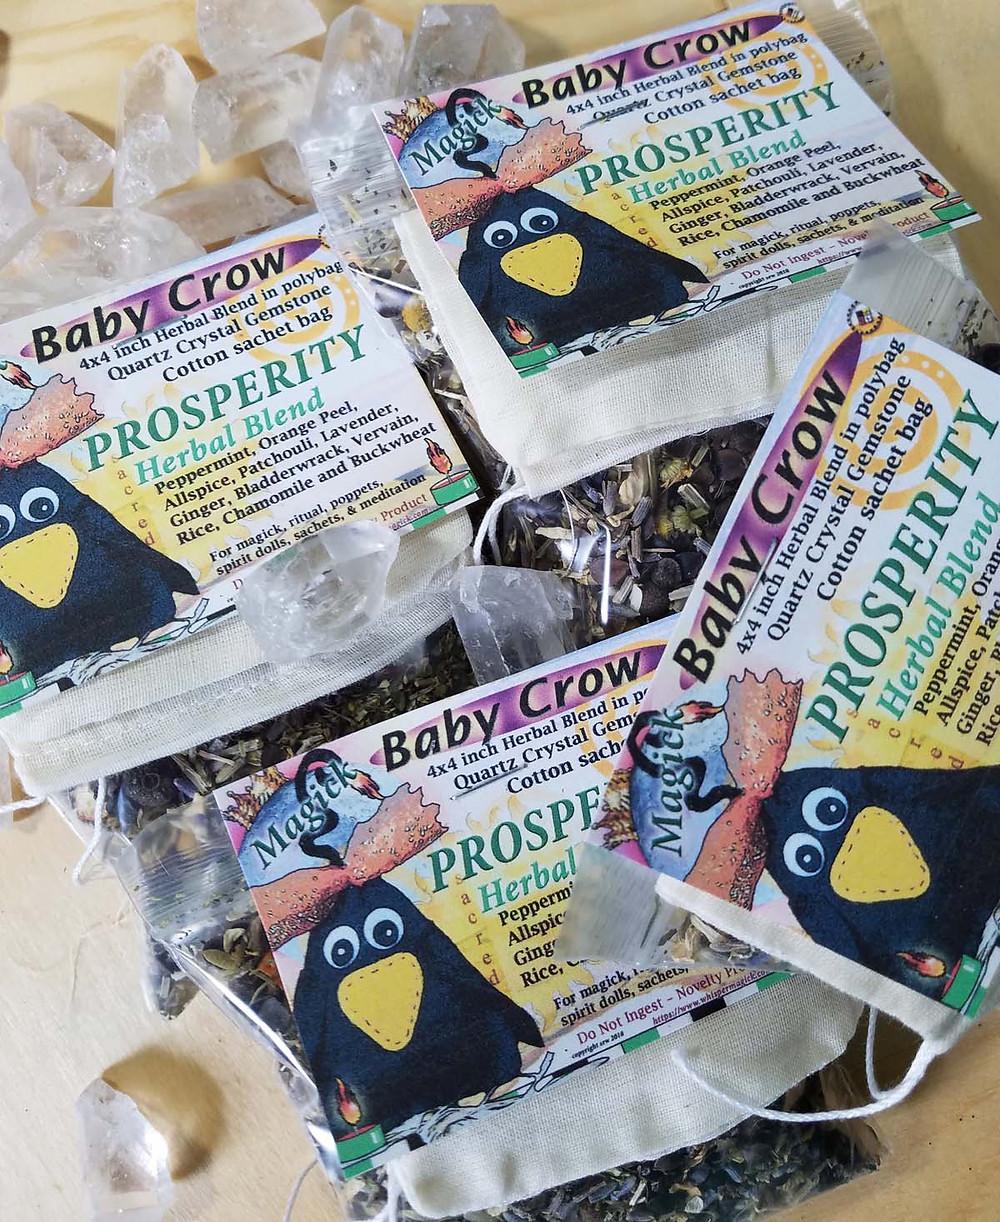 Prosperity packets